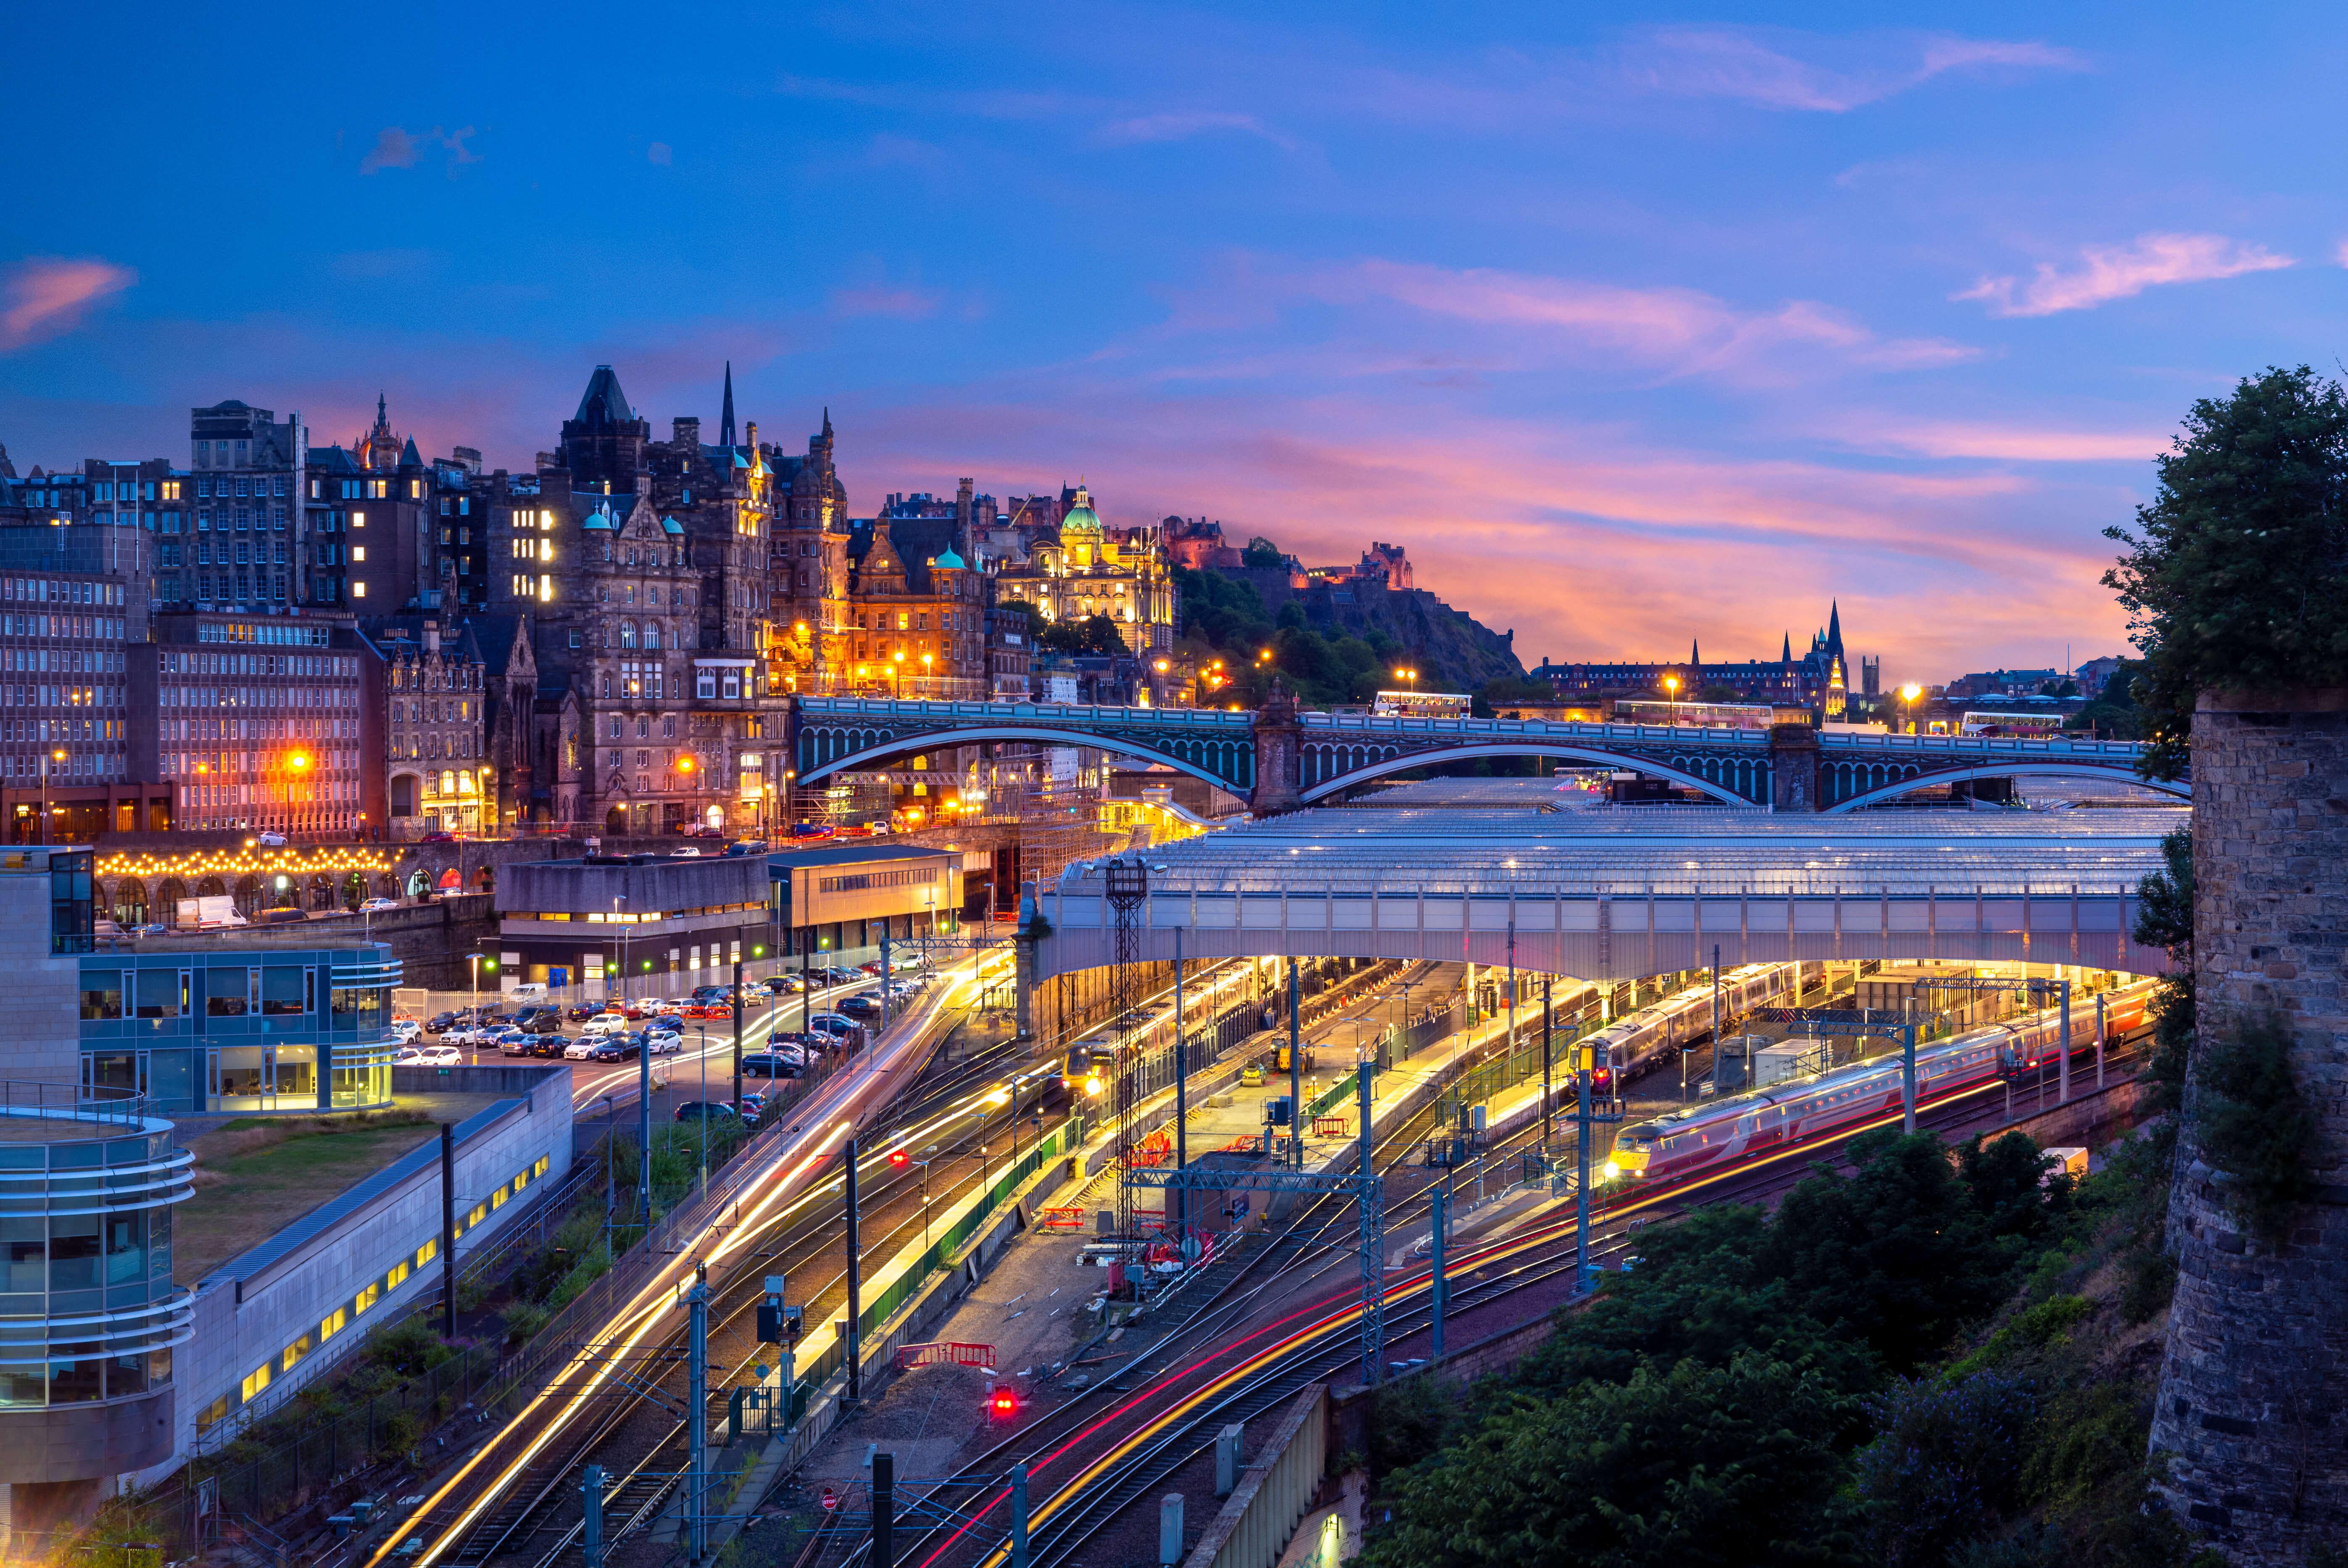 Edinburgh Waverley at night